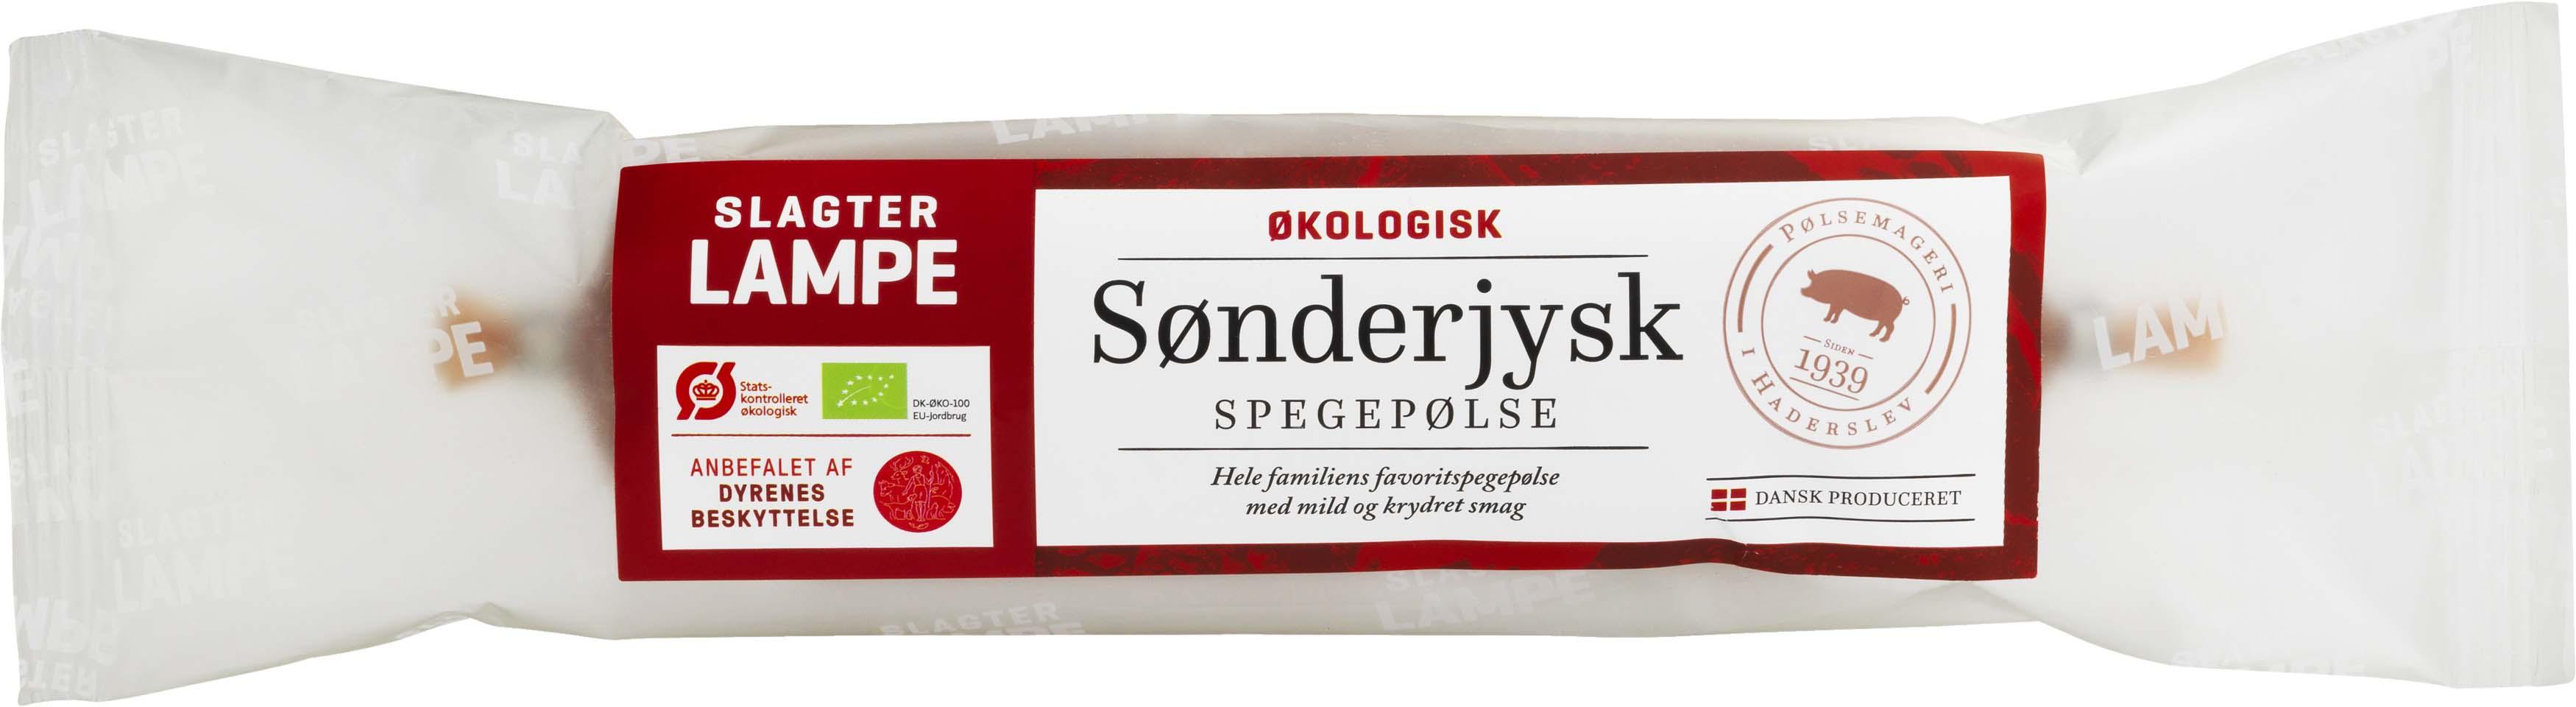 Økologisk Sønderjysk spegepølse